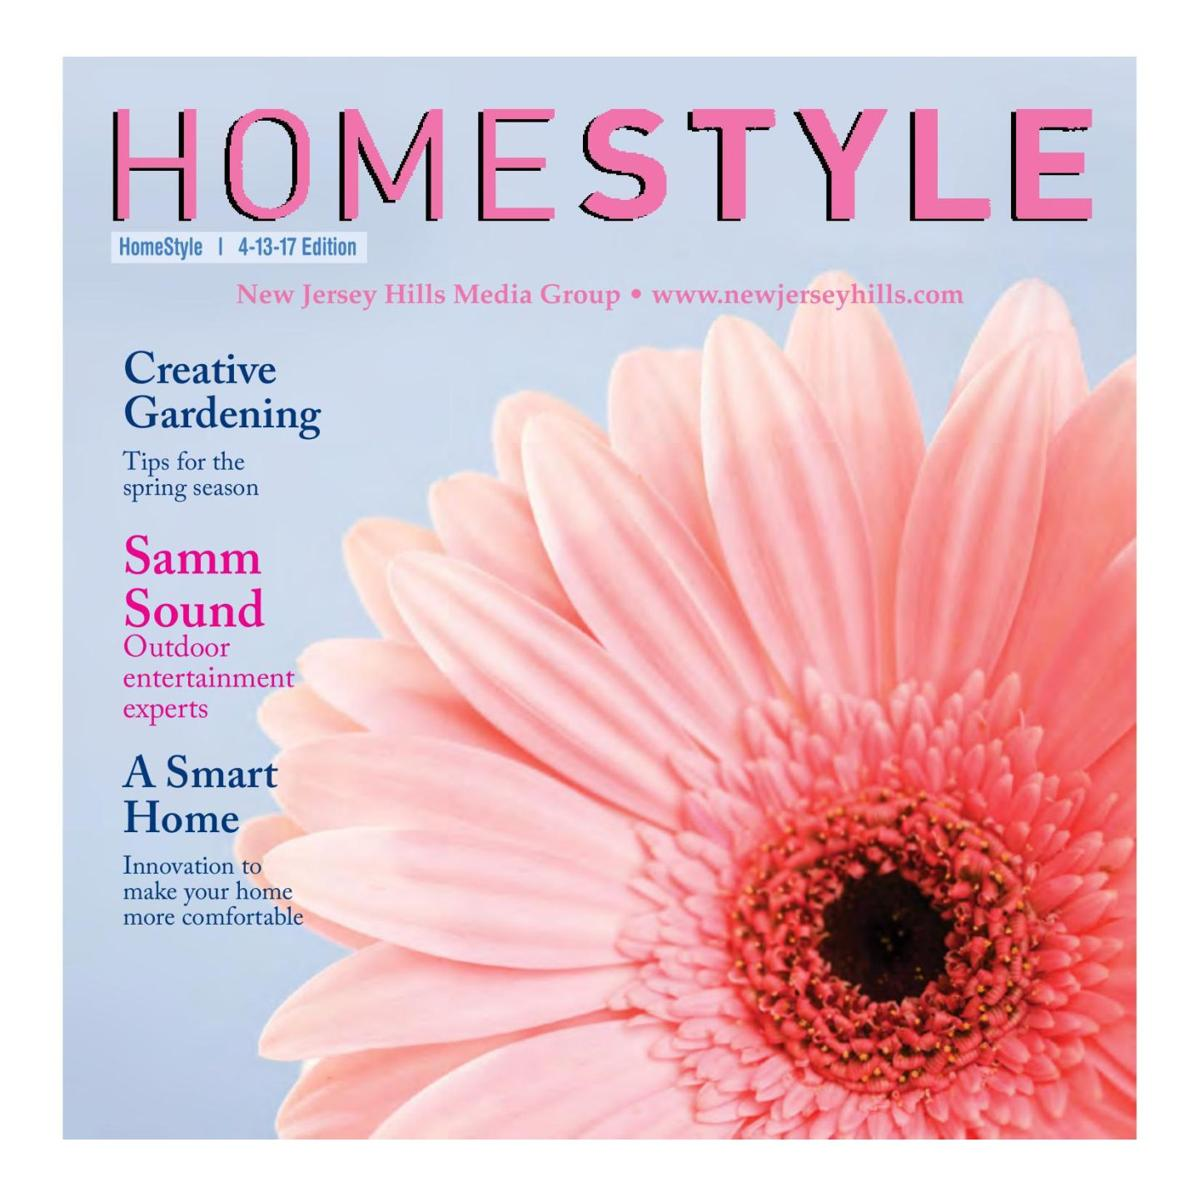 Spring Homestyle - April 13, 2017